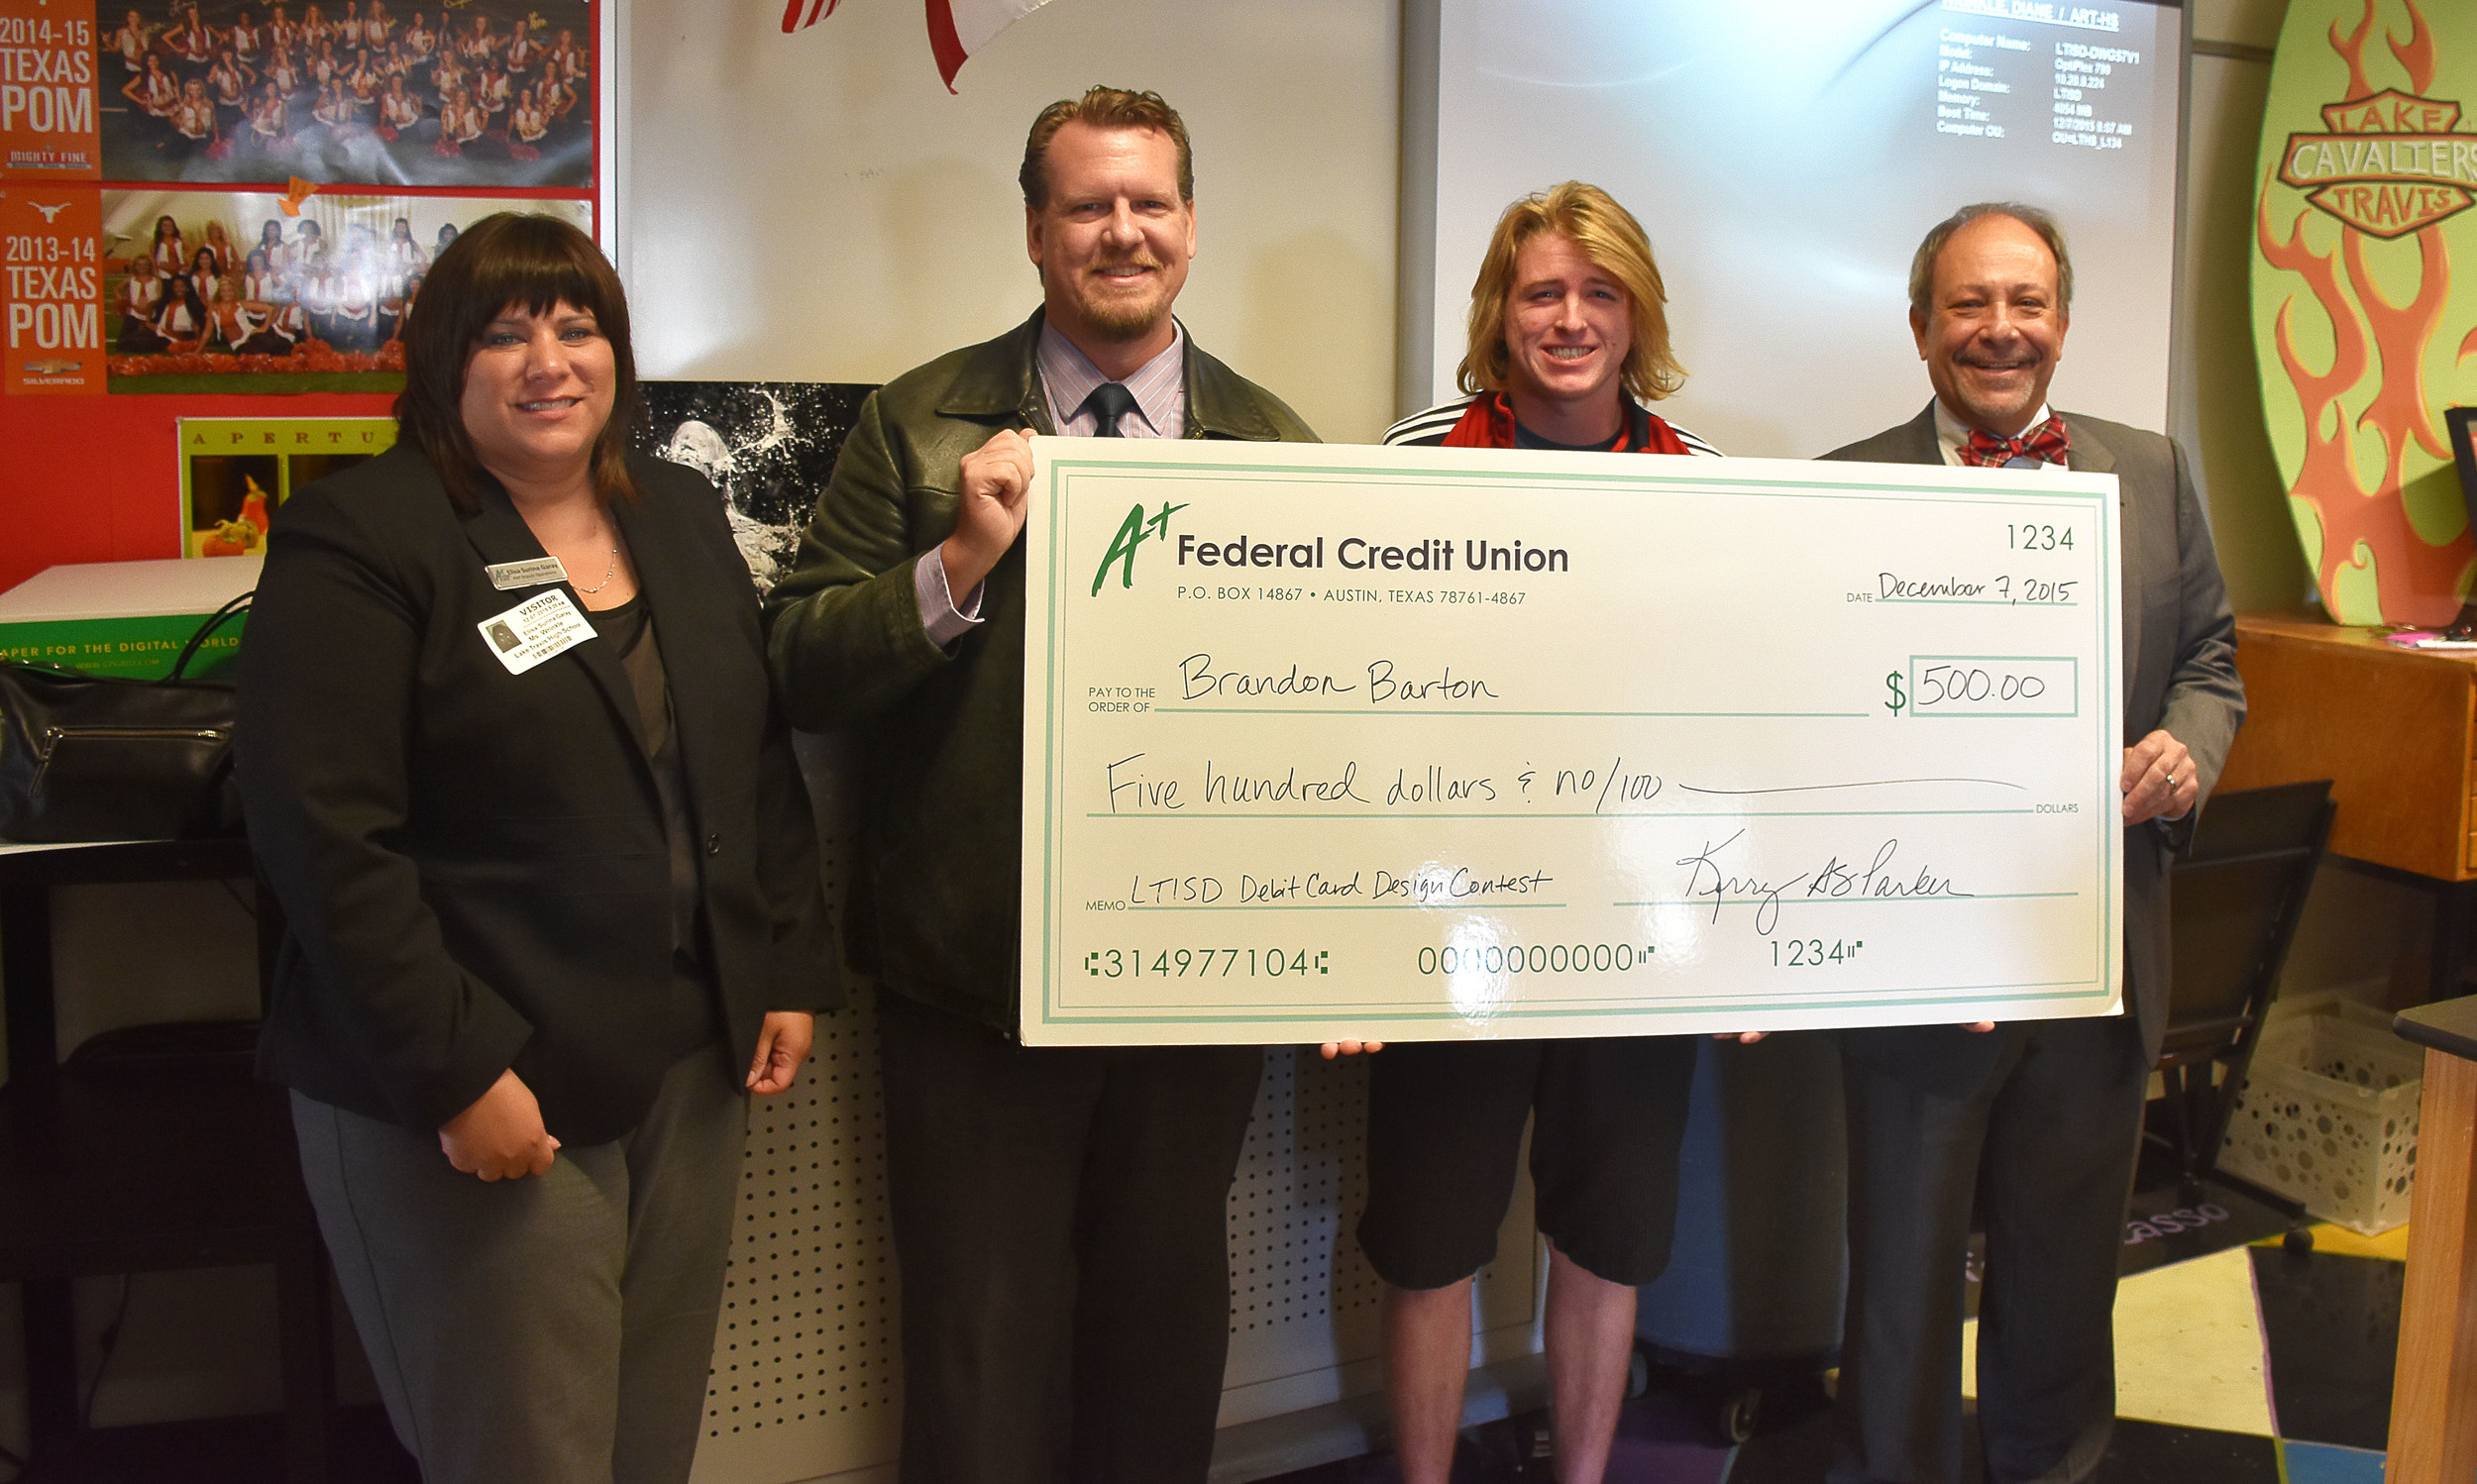 A+FCU awards Brandon Burton $500 for his card design.